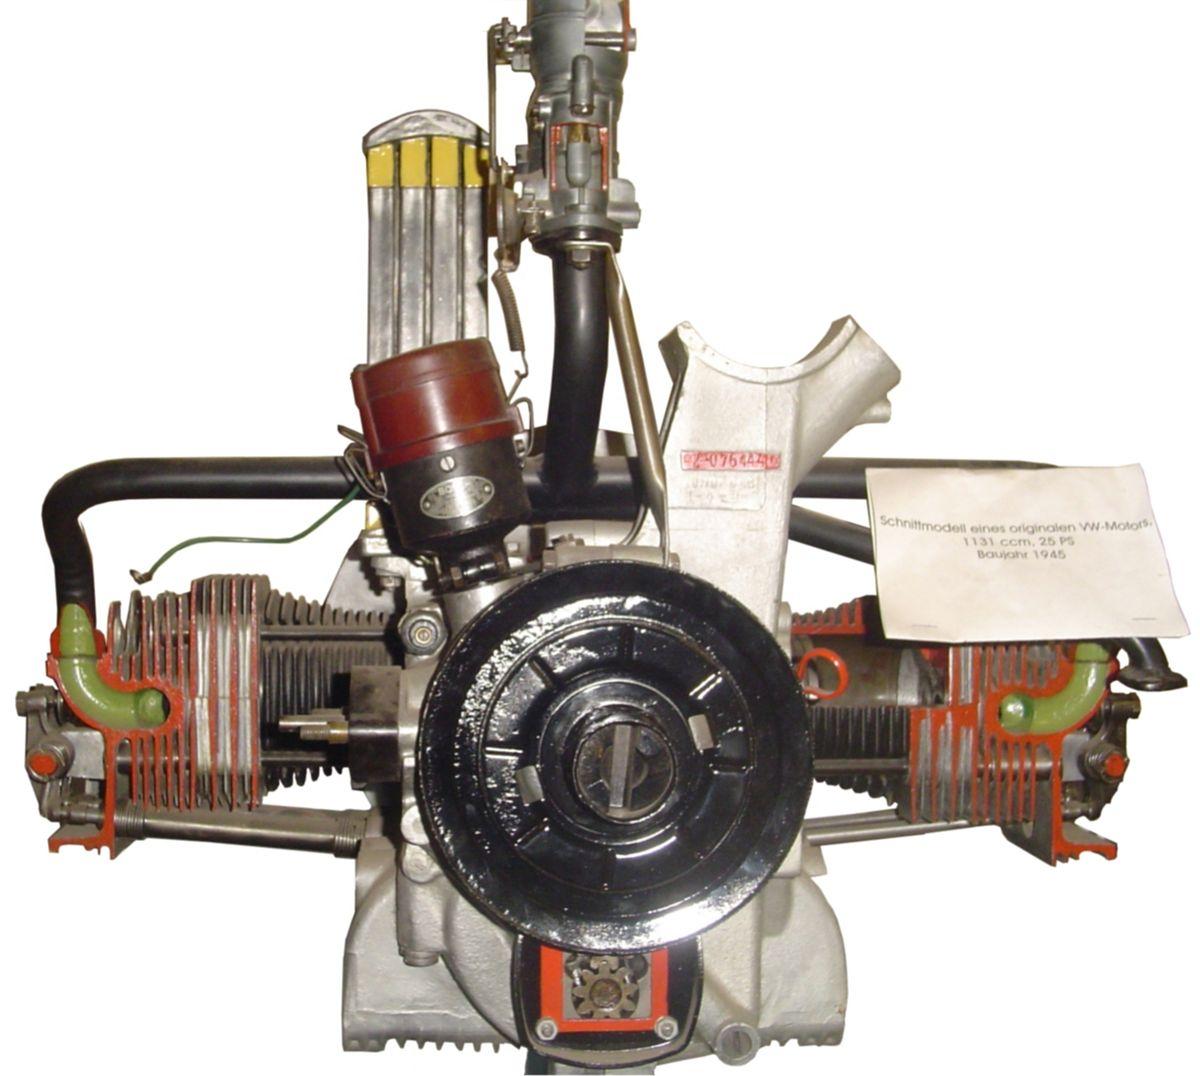 XS_1166] Vw Beetle Engine Tin Diagram On 1600 Volkswagen Engine Diagram  Download DiagramIcand Ixtu Phae Mohammedshrine Librar Wiring 101